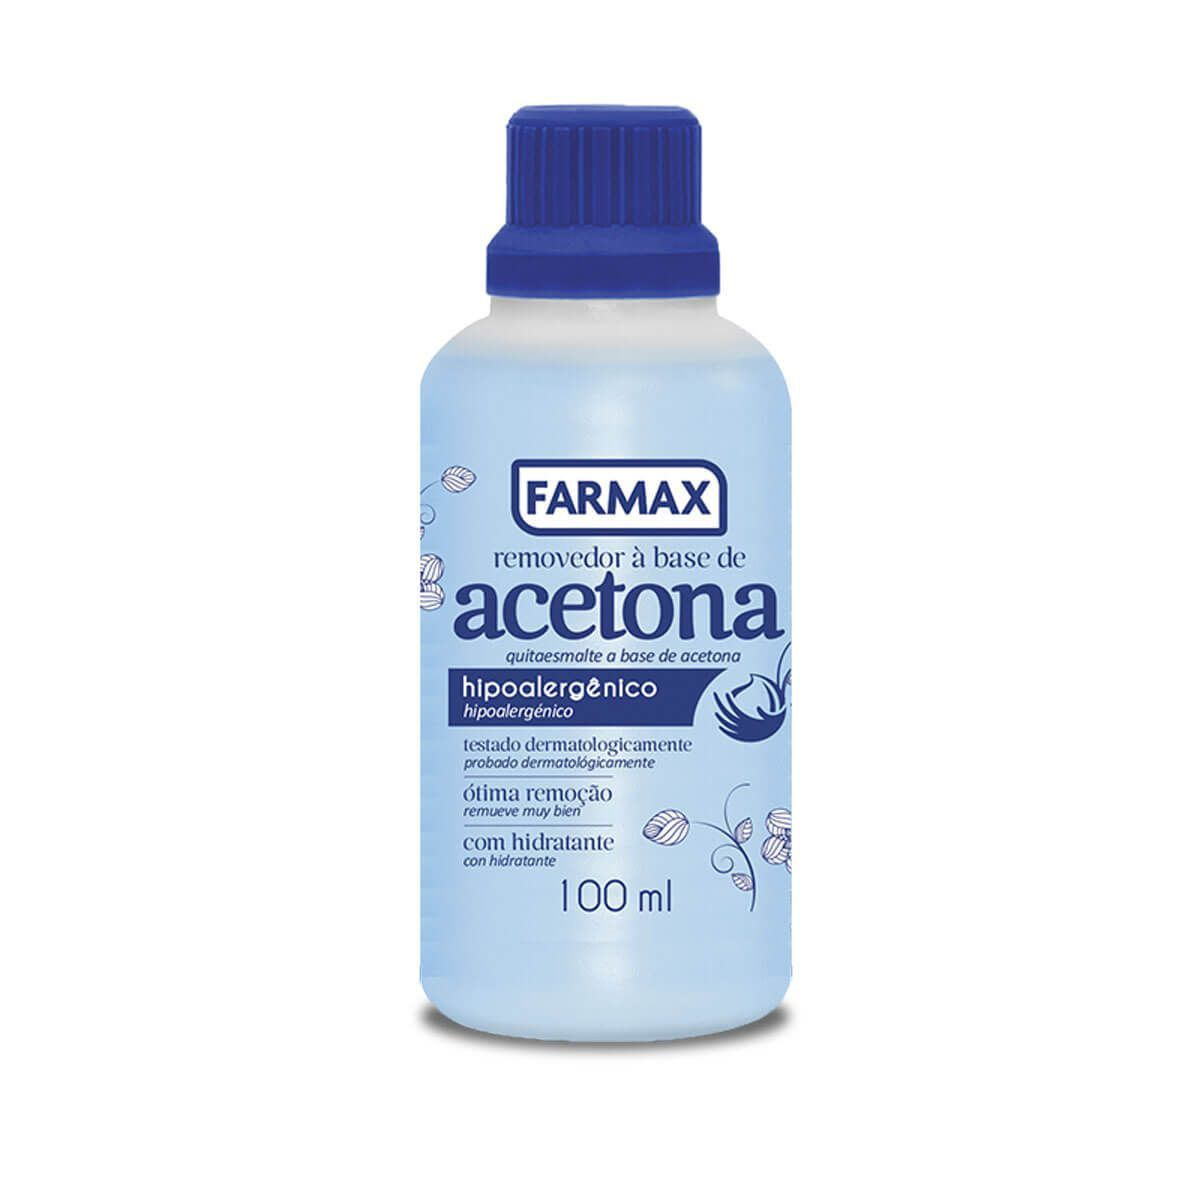 REMOV ESM ACETONA BLUE FARMAX 100ml  - LUISA PERFUMARIA E COSMETICOS